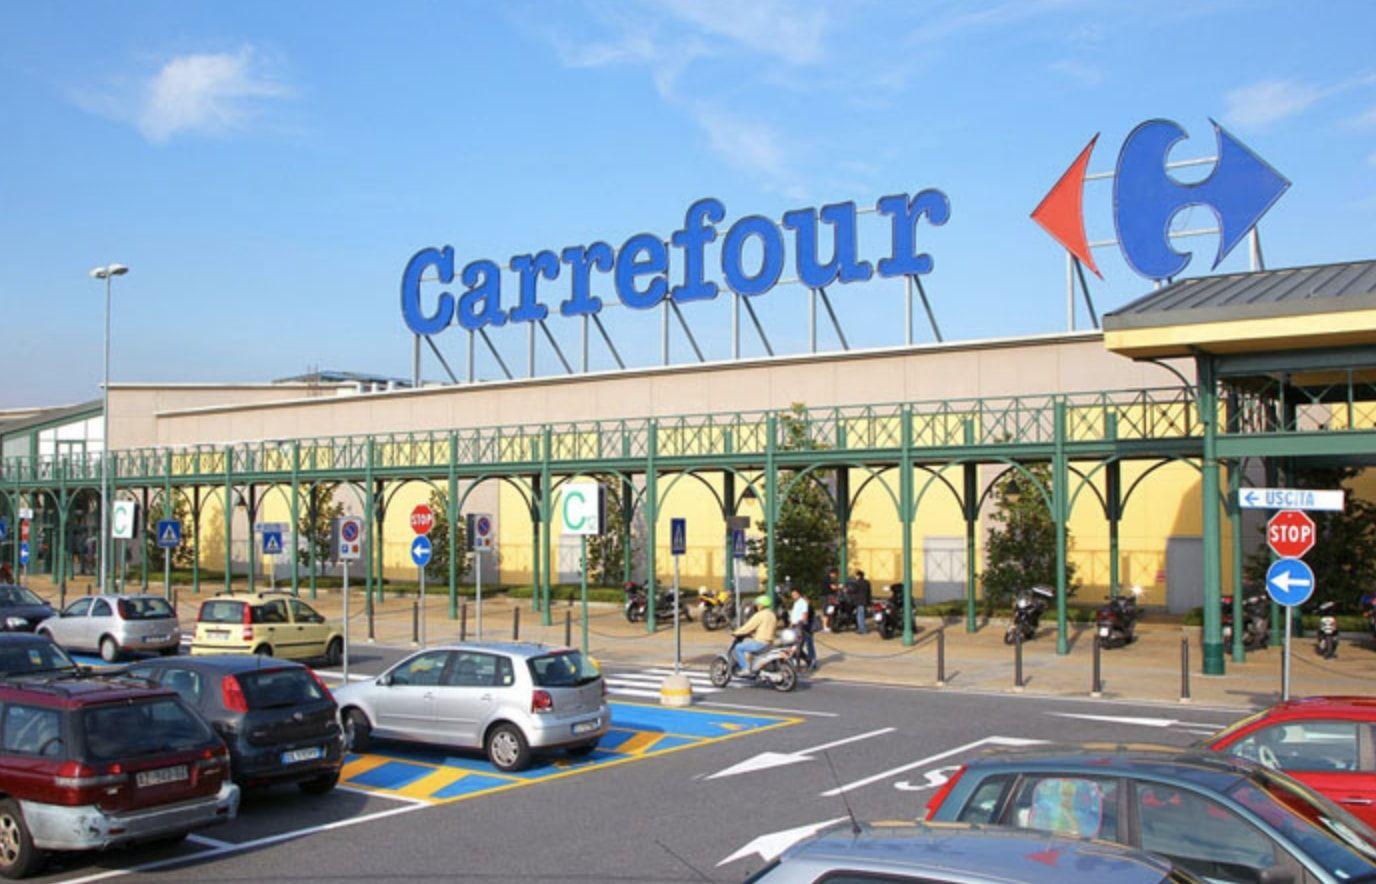 French Supermarket Giant Carrefour Now Selling Vegan Gardein